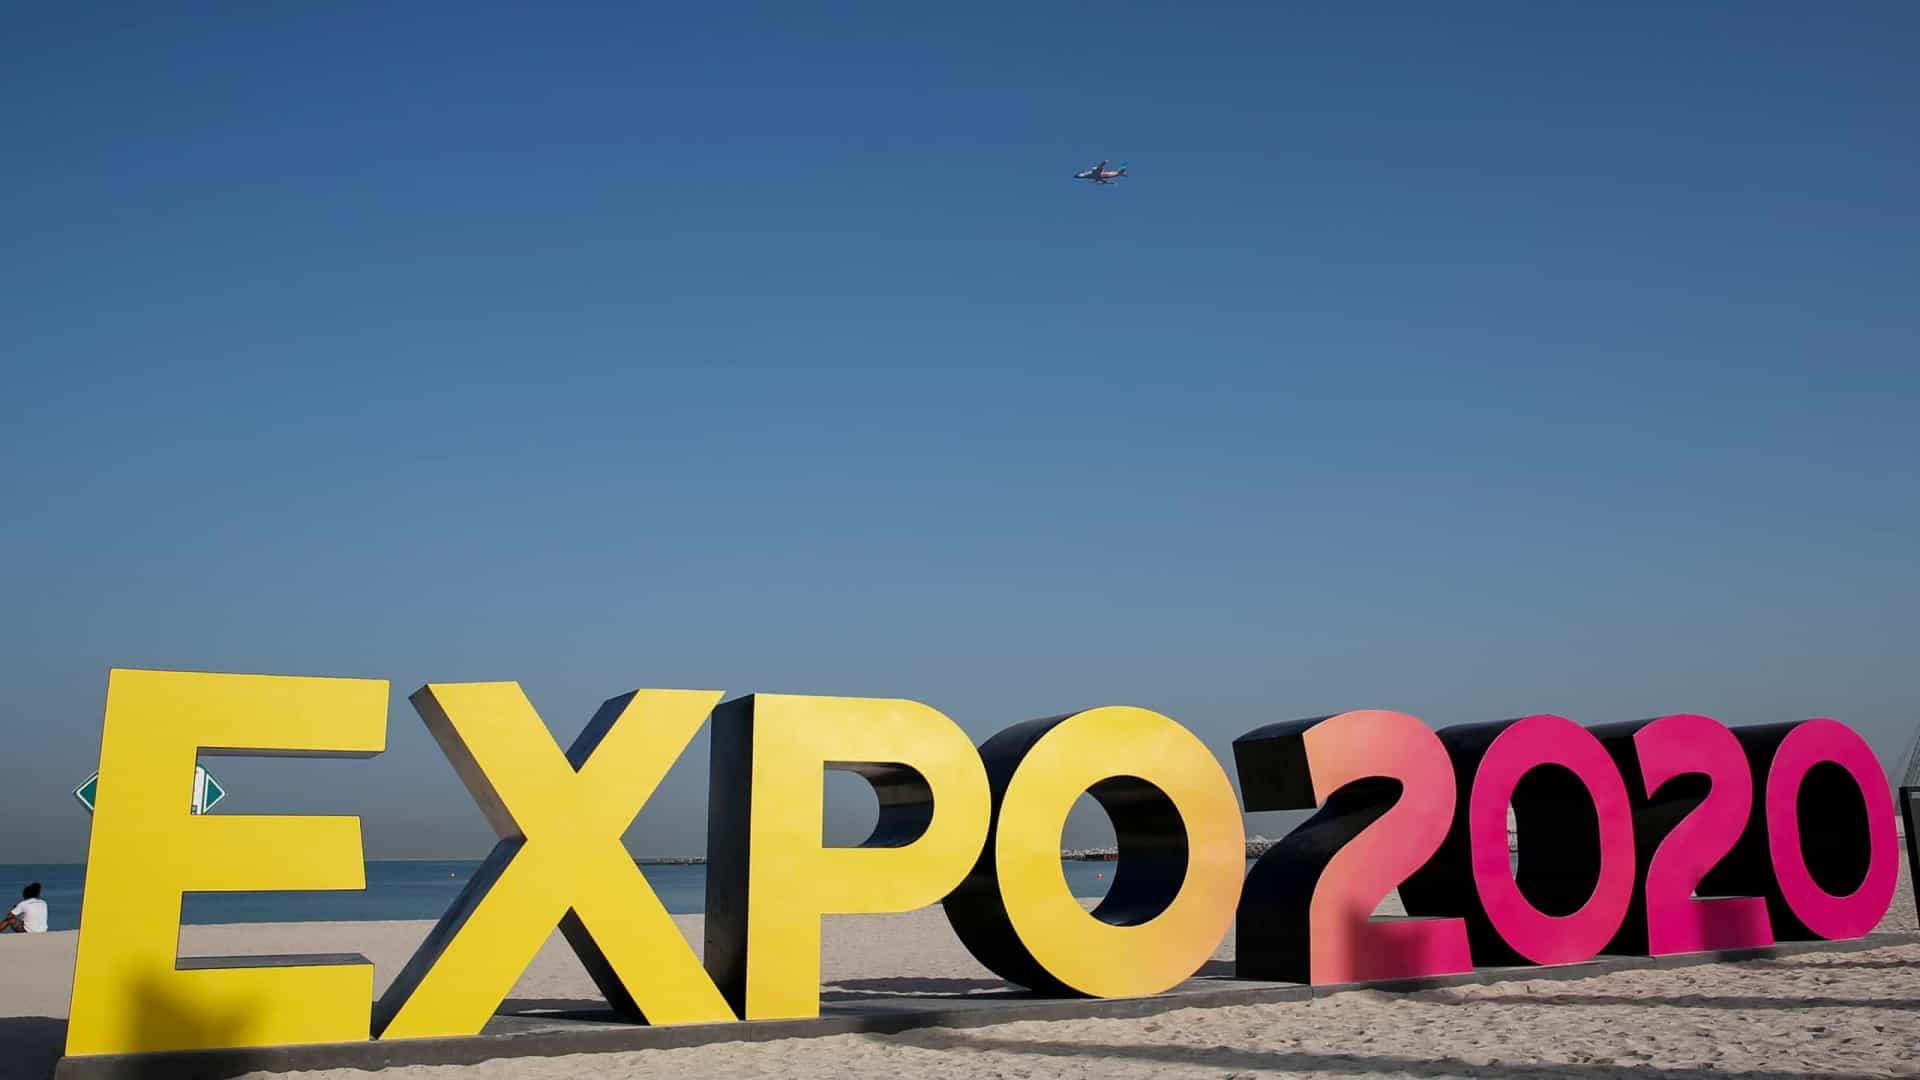 Expo Dubai recebe Festival da Lusofonia até sábado